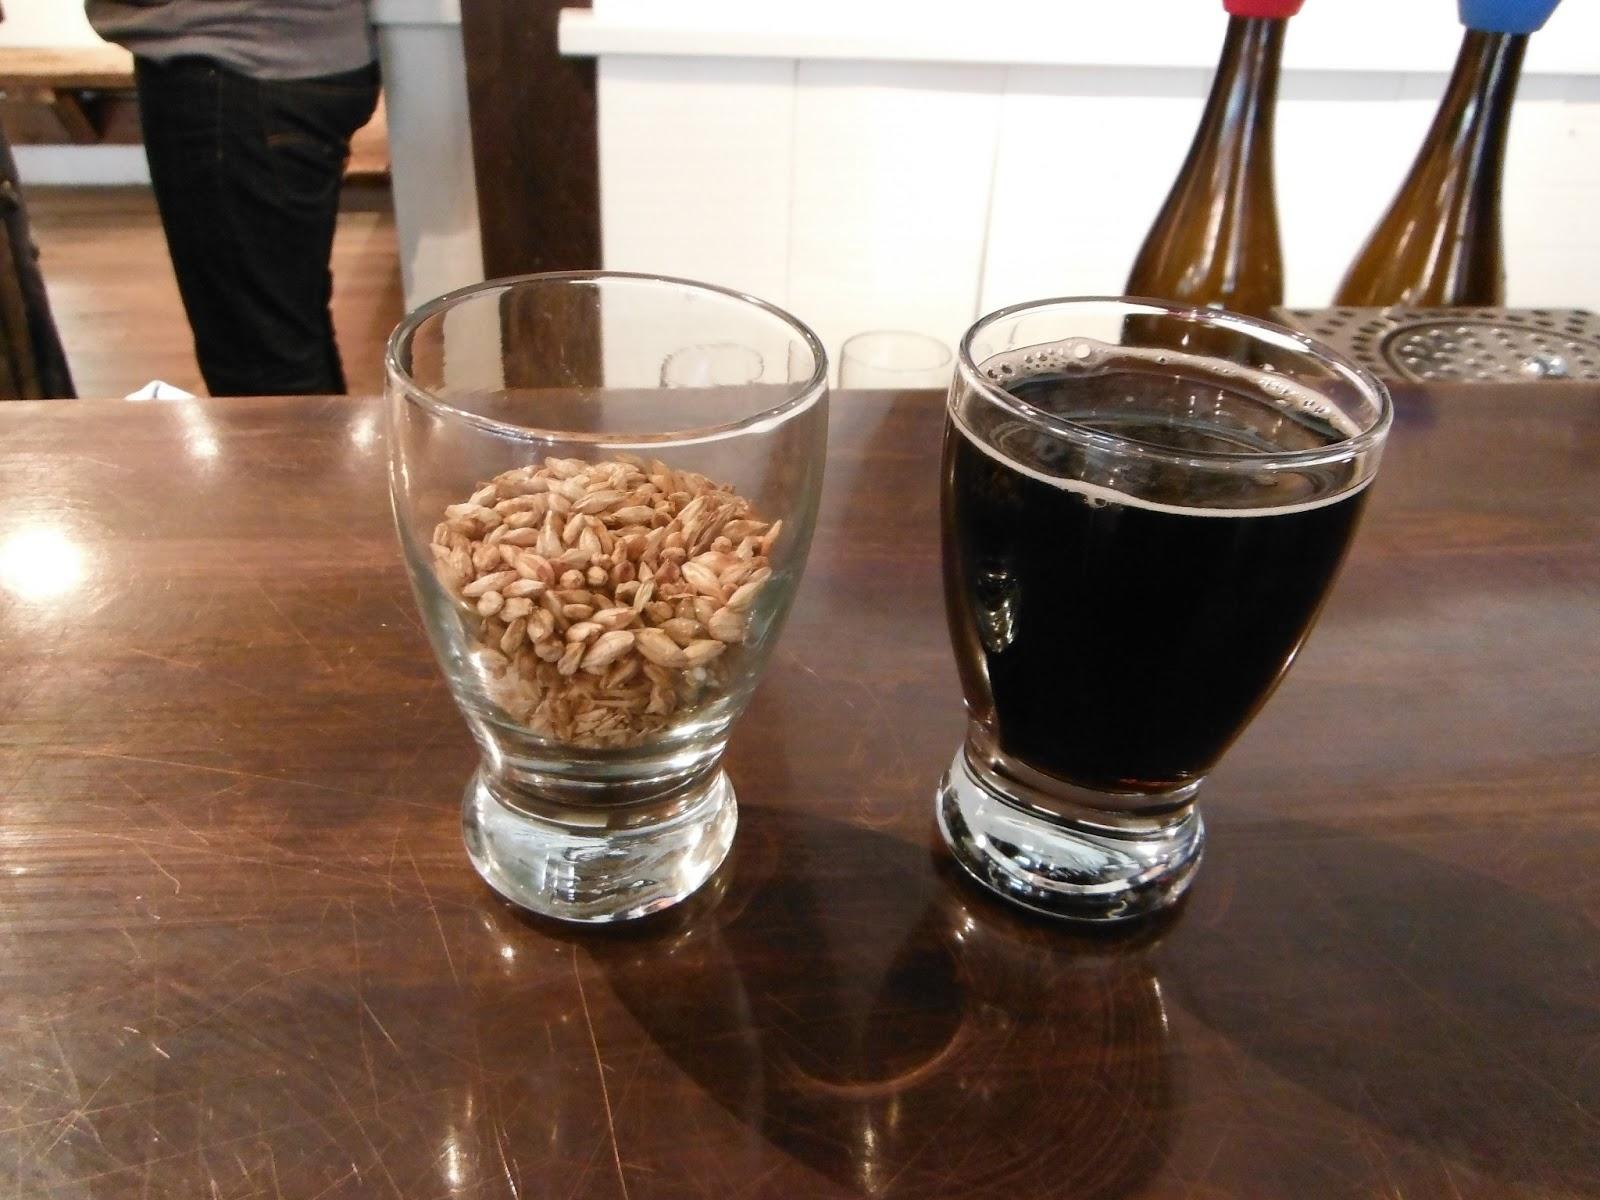 Clockwatching Tart: The Beer Baron - Road Trip: Finding ...